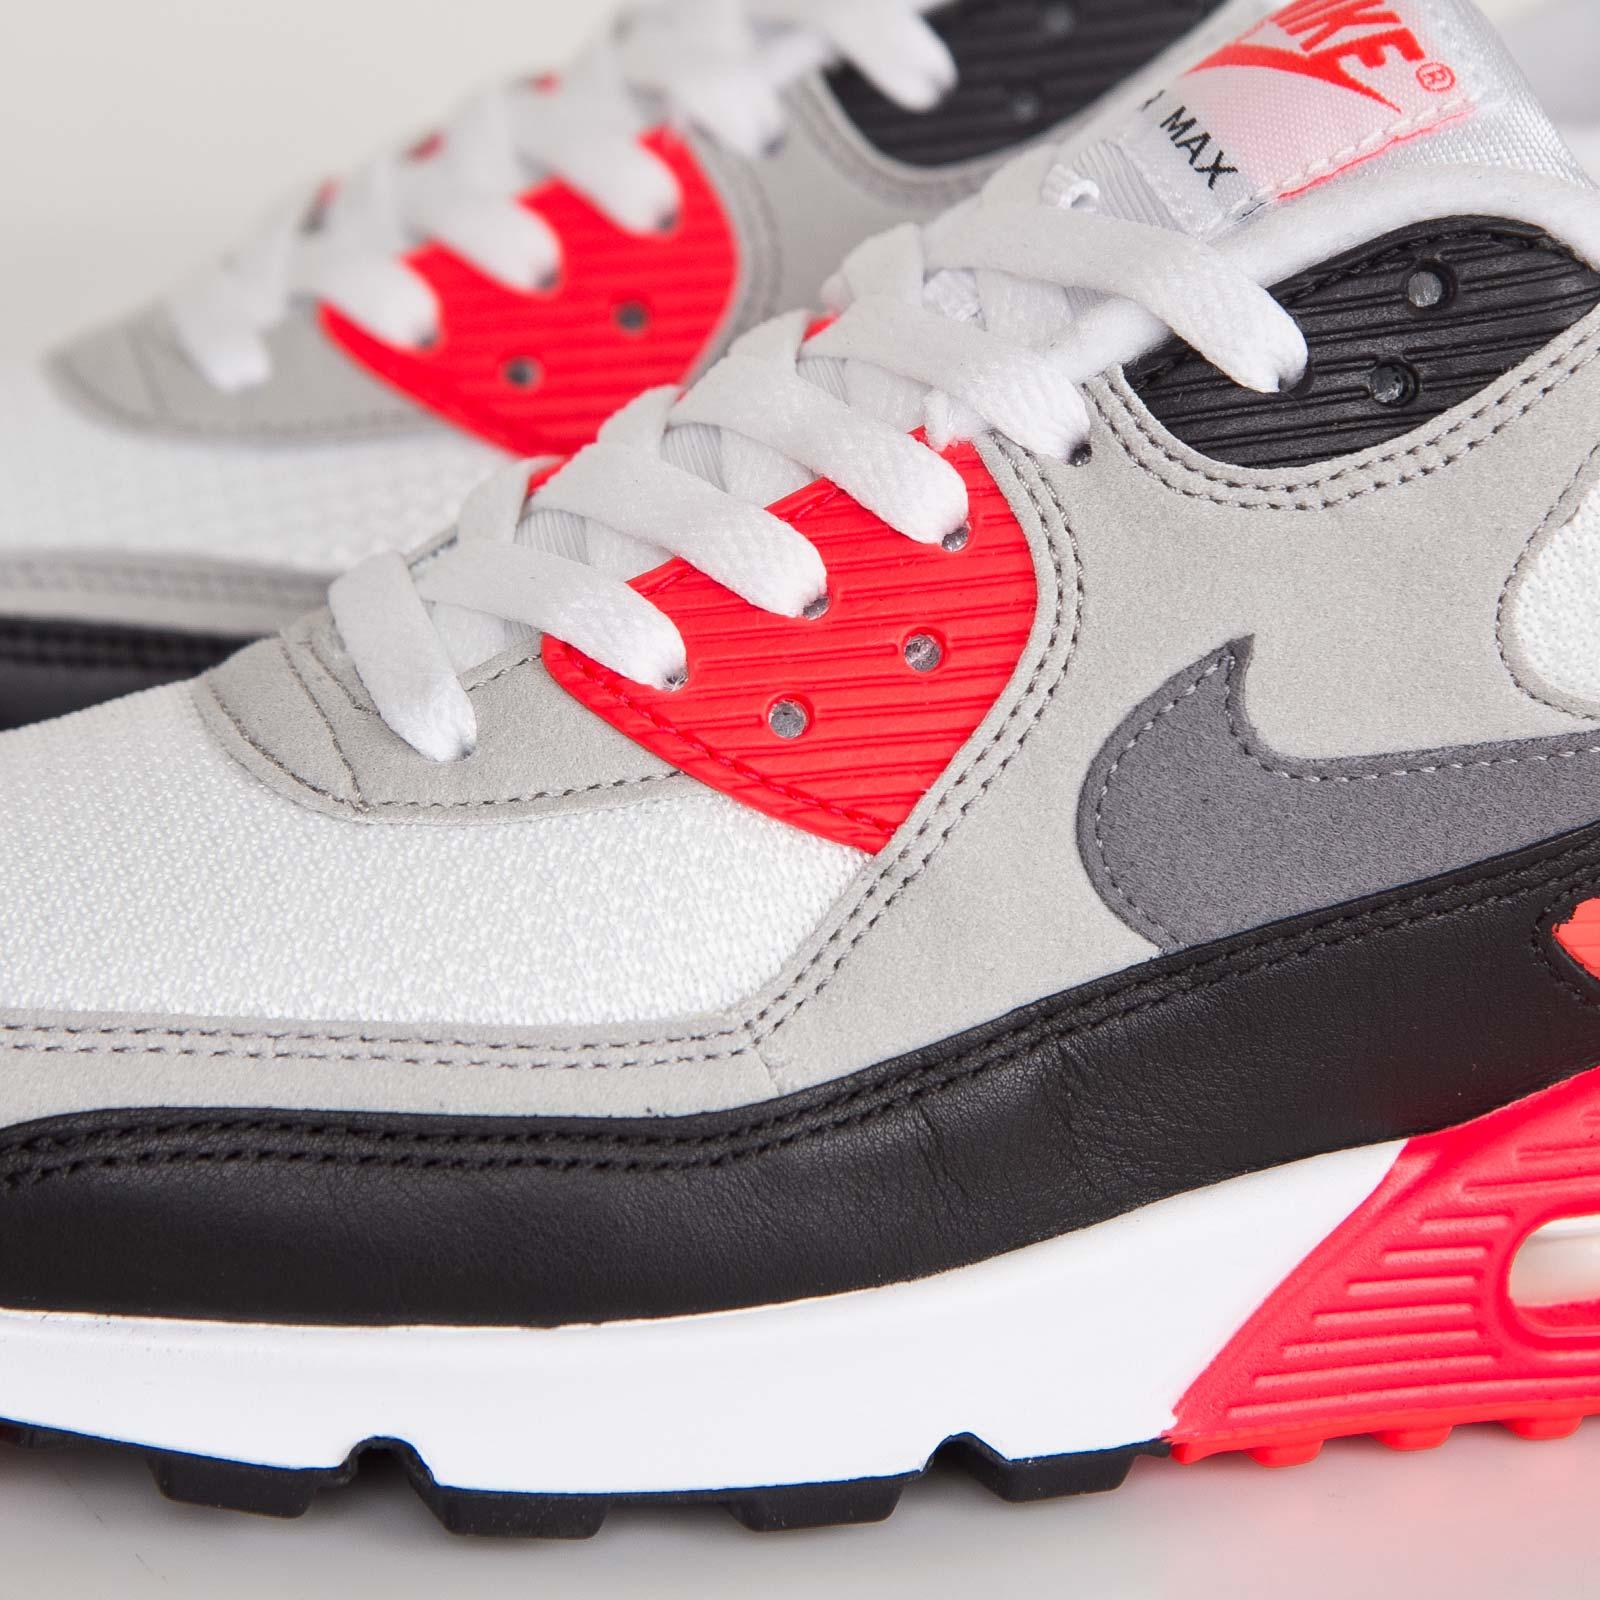 new product ea5a2 94380 Nike Air Max 90 OG - 725233-106 - Sneakersnstuff   sneakers & streetwear  online since 1999